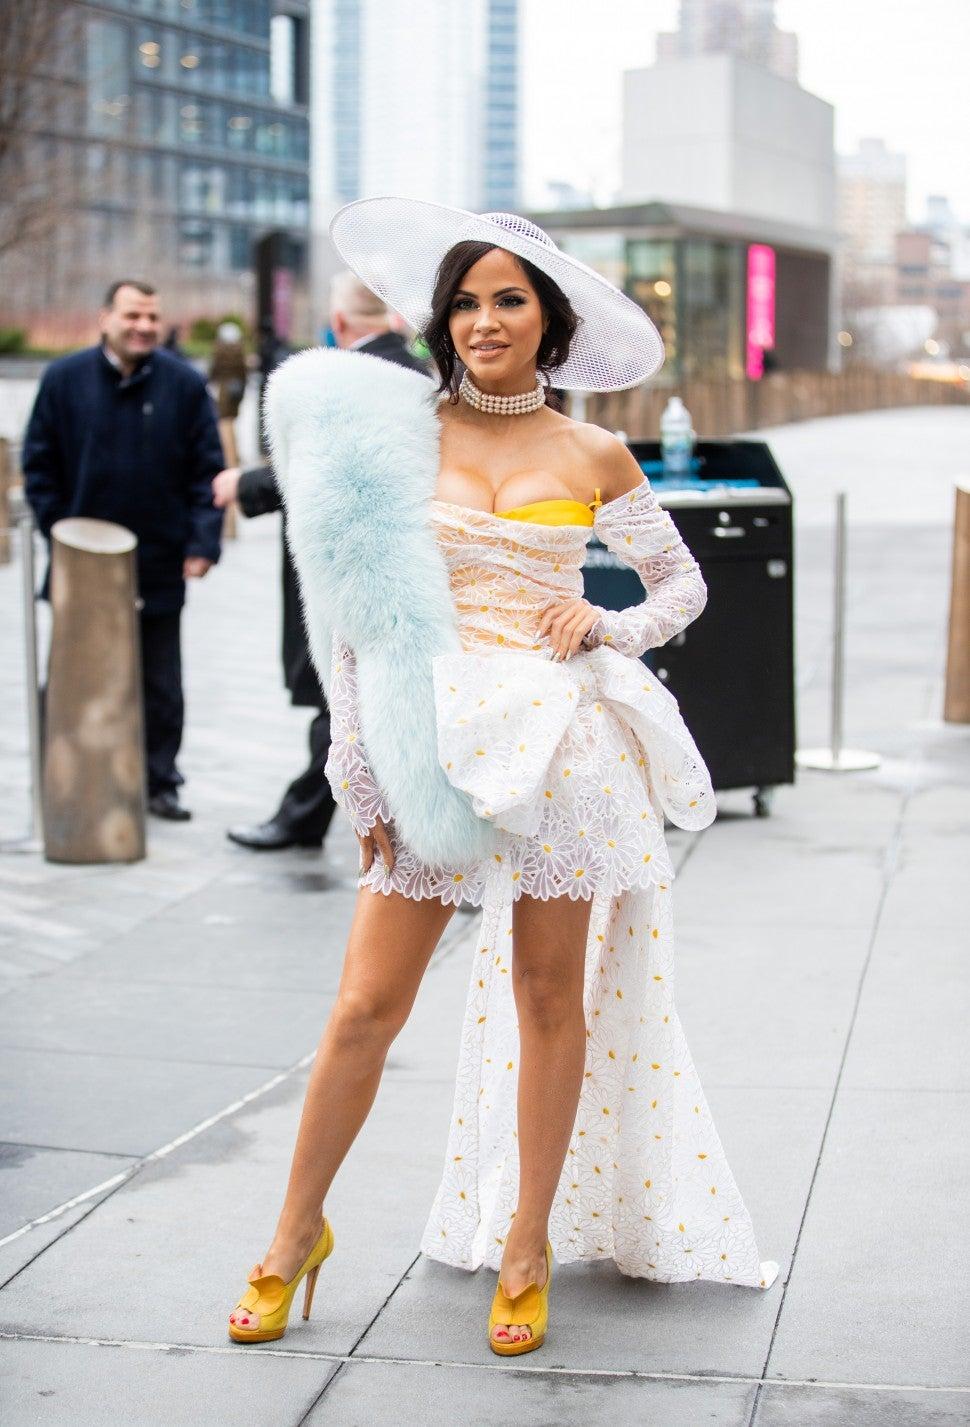 Carolina Herrera Natti Natasha NYFW